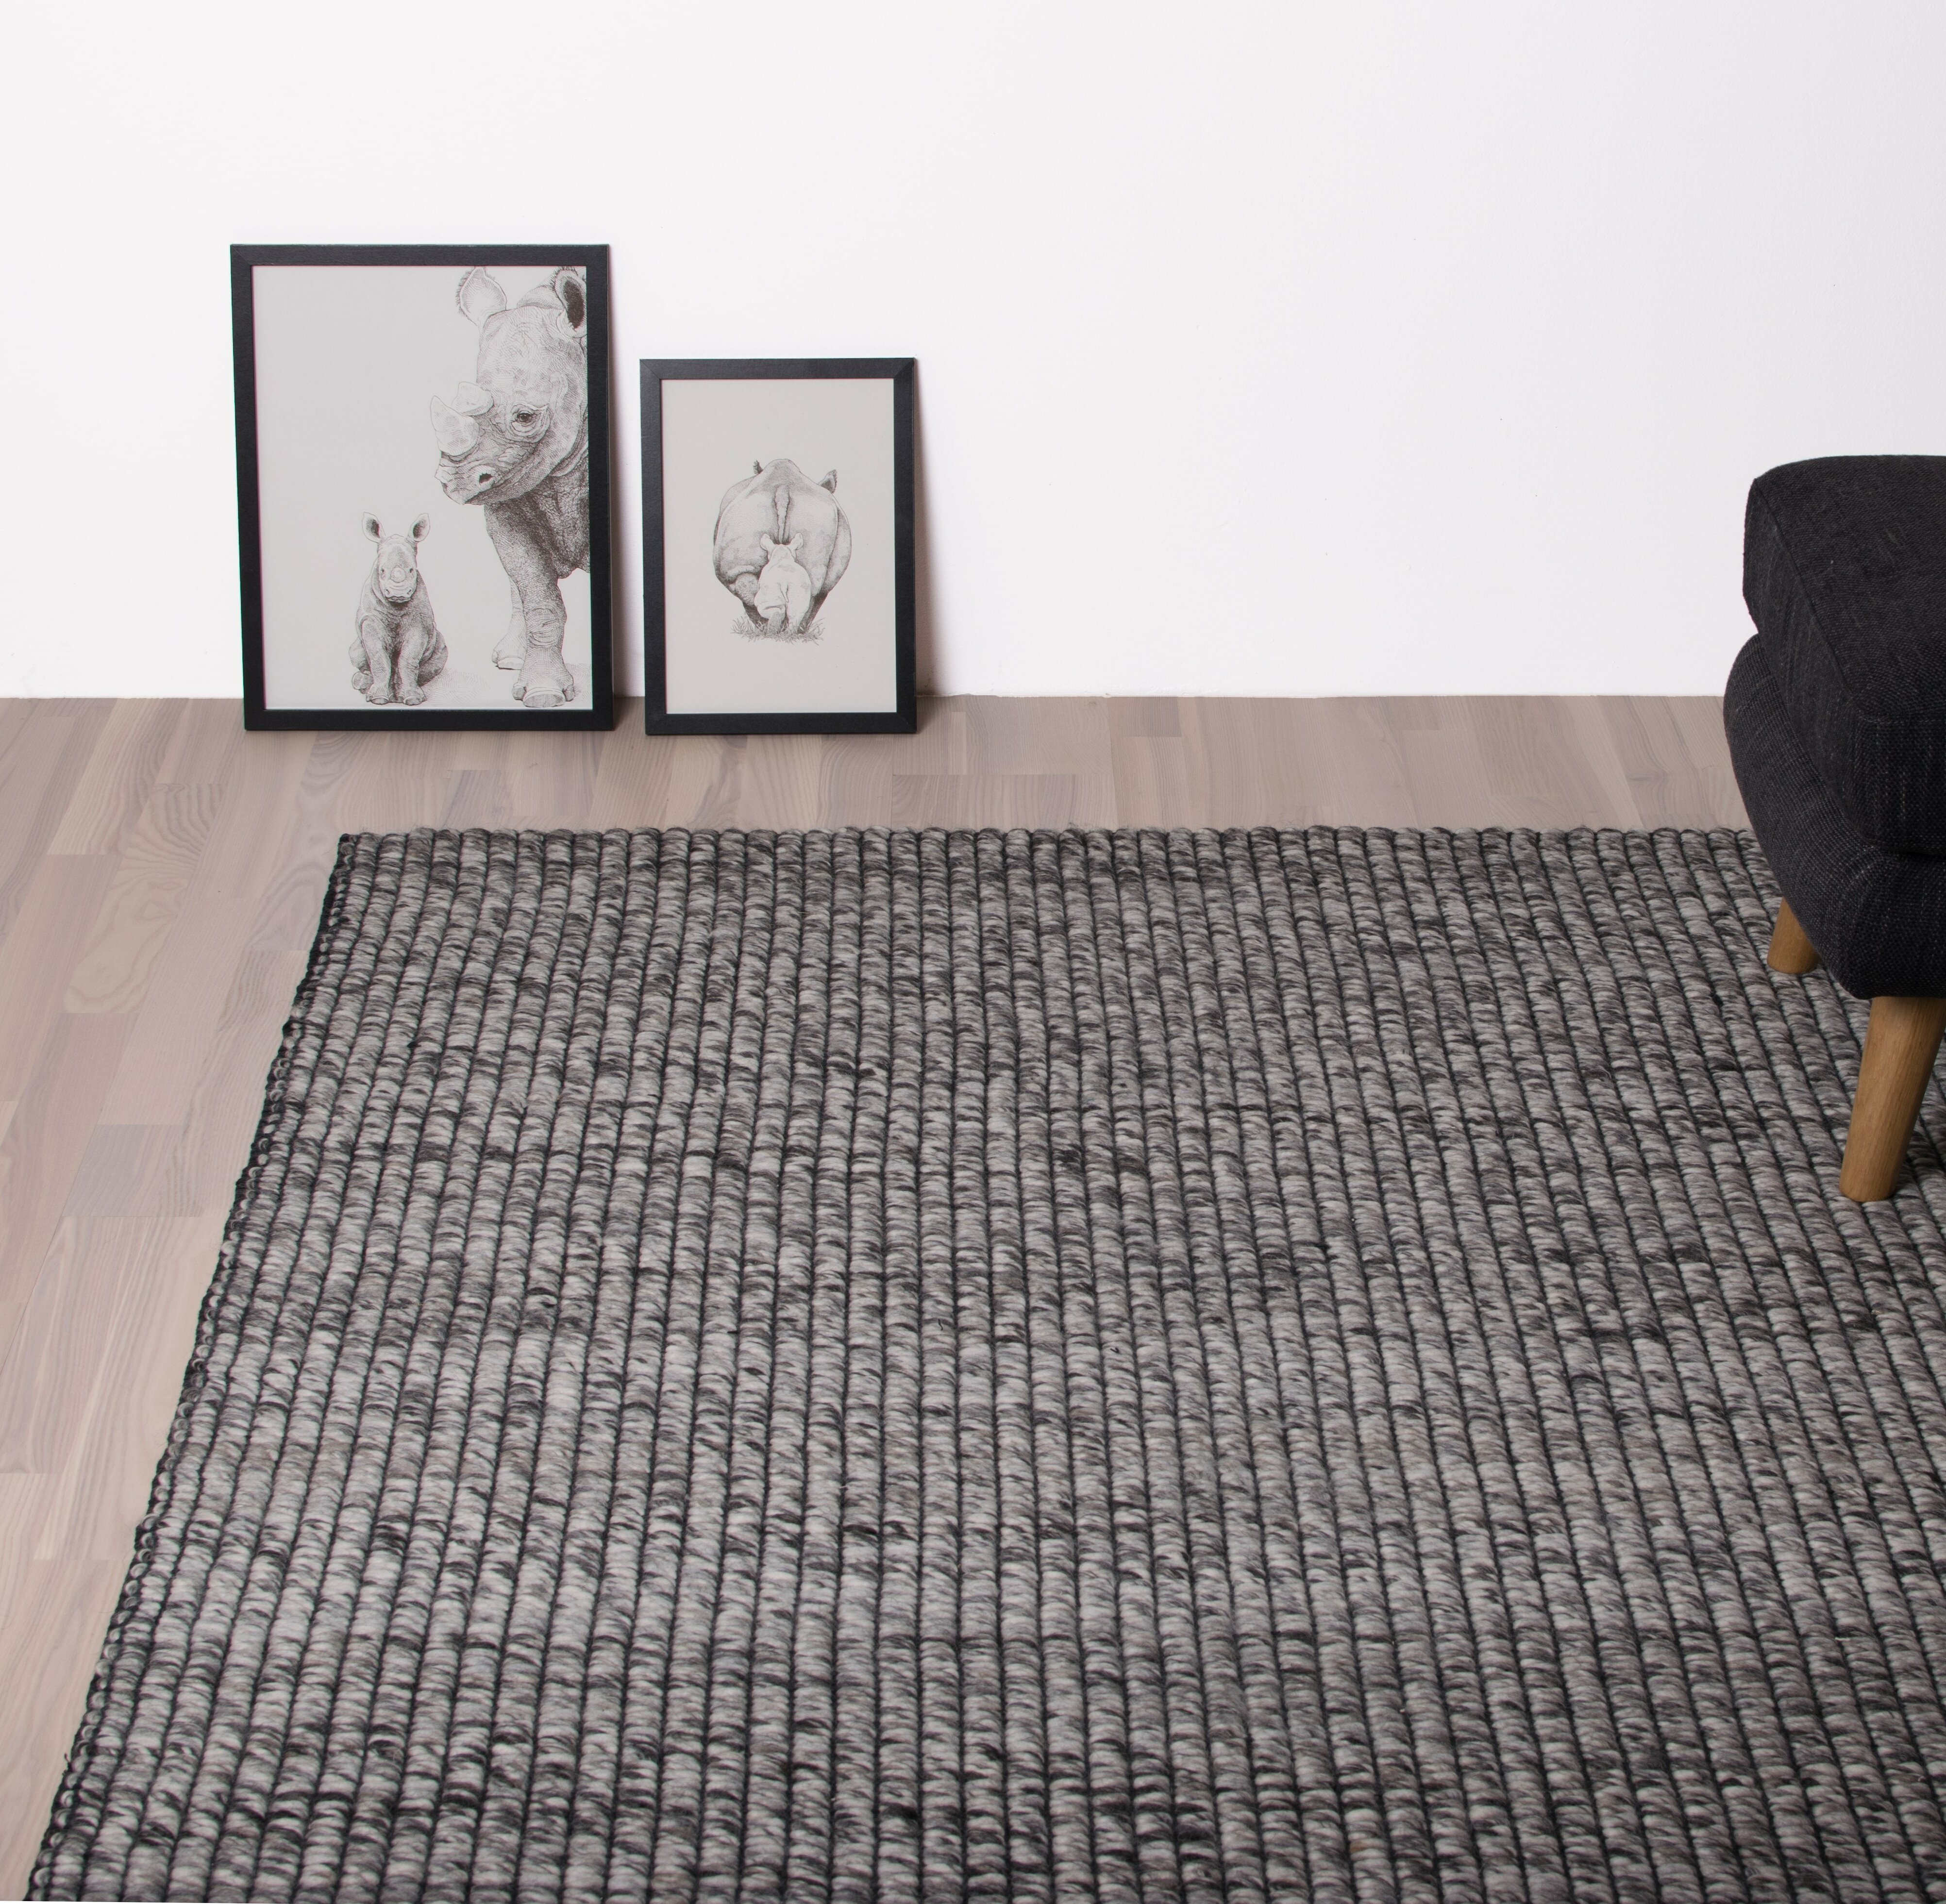 Hc Taepper Handgefertigter Teppich Iceland In Grau Wayfair De